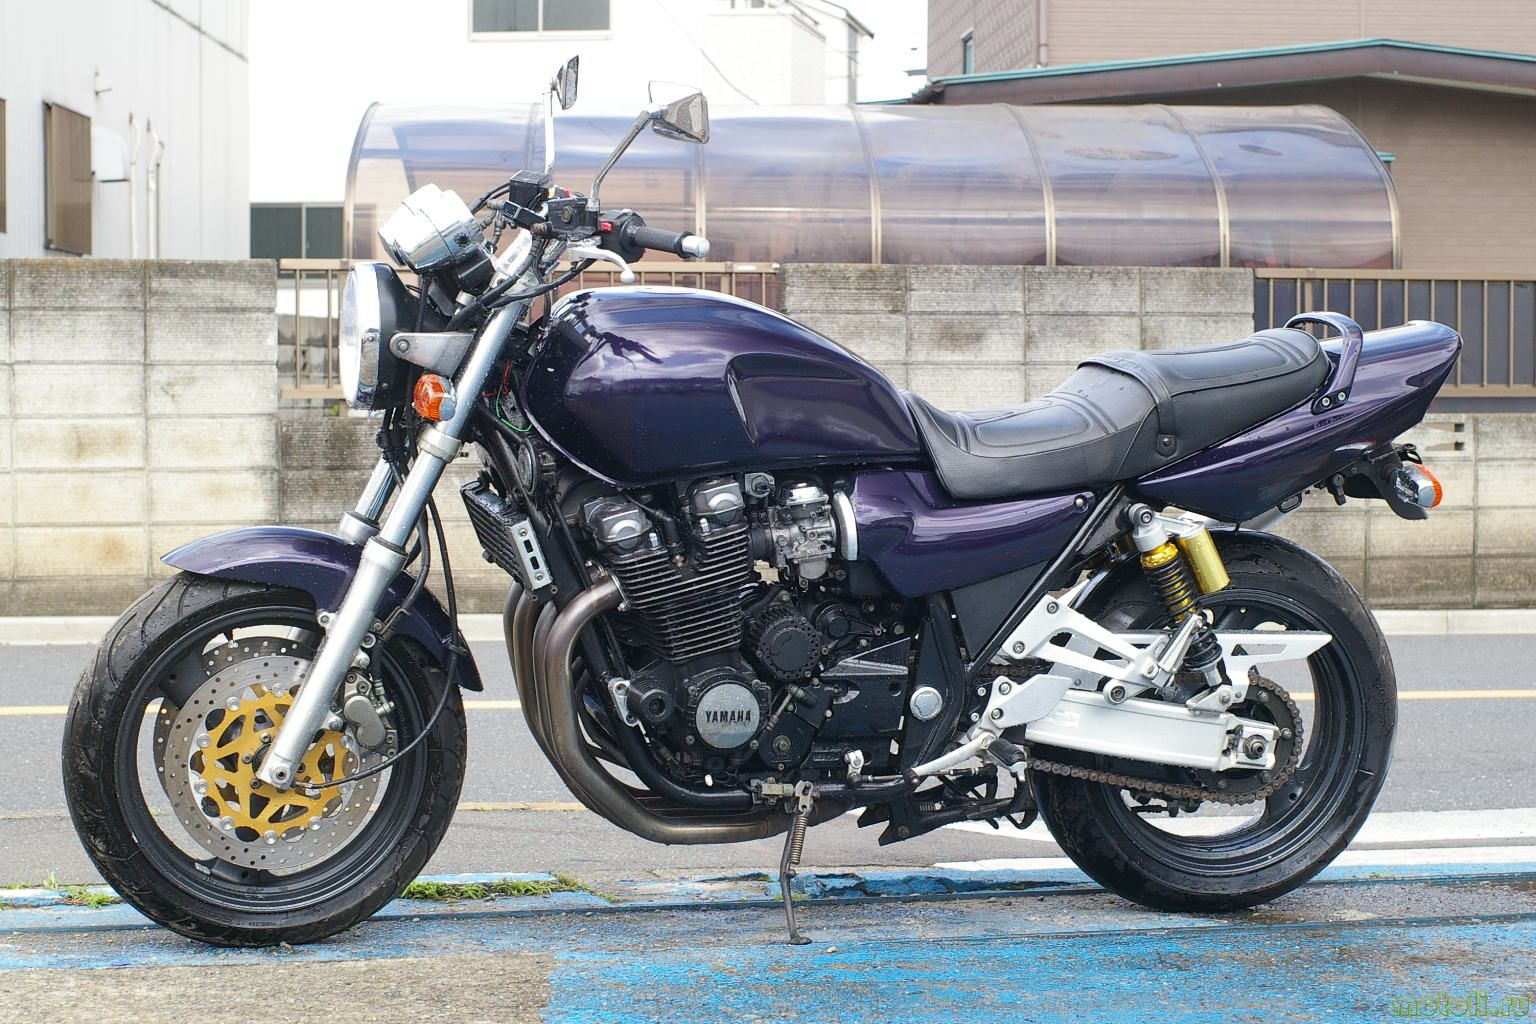 Тест-драйв мотоцикла Yamaha XJR400